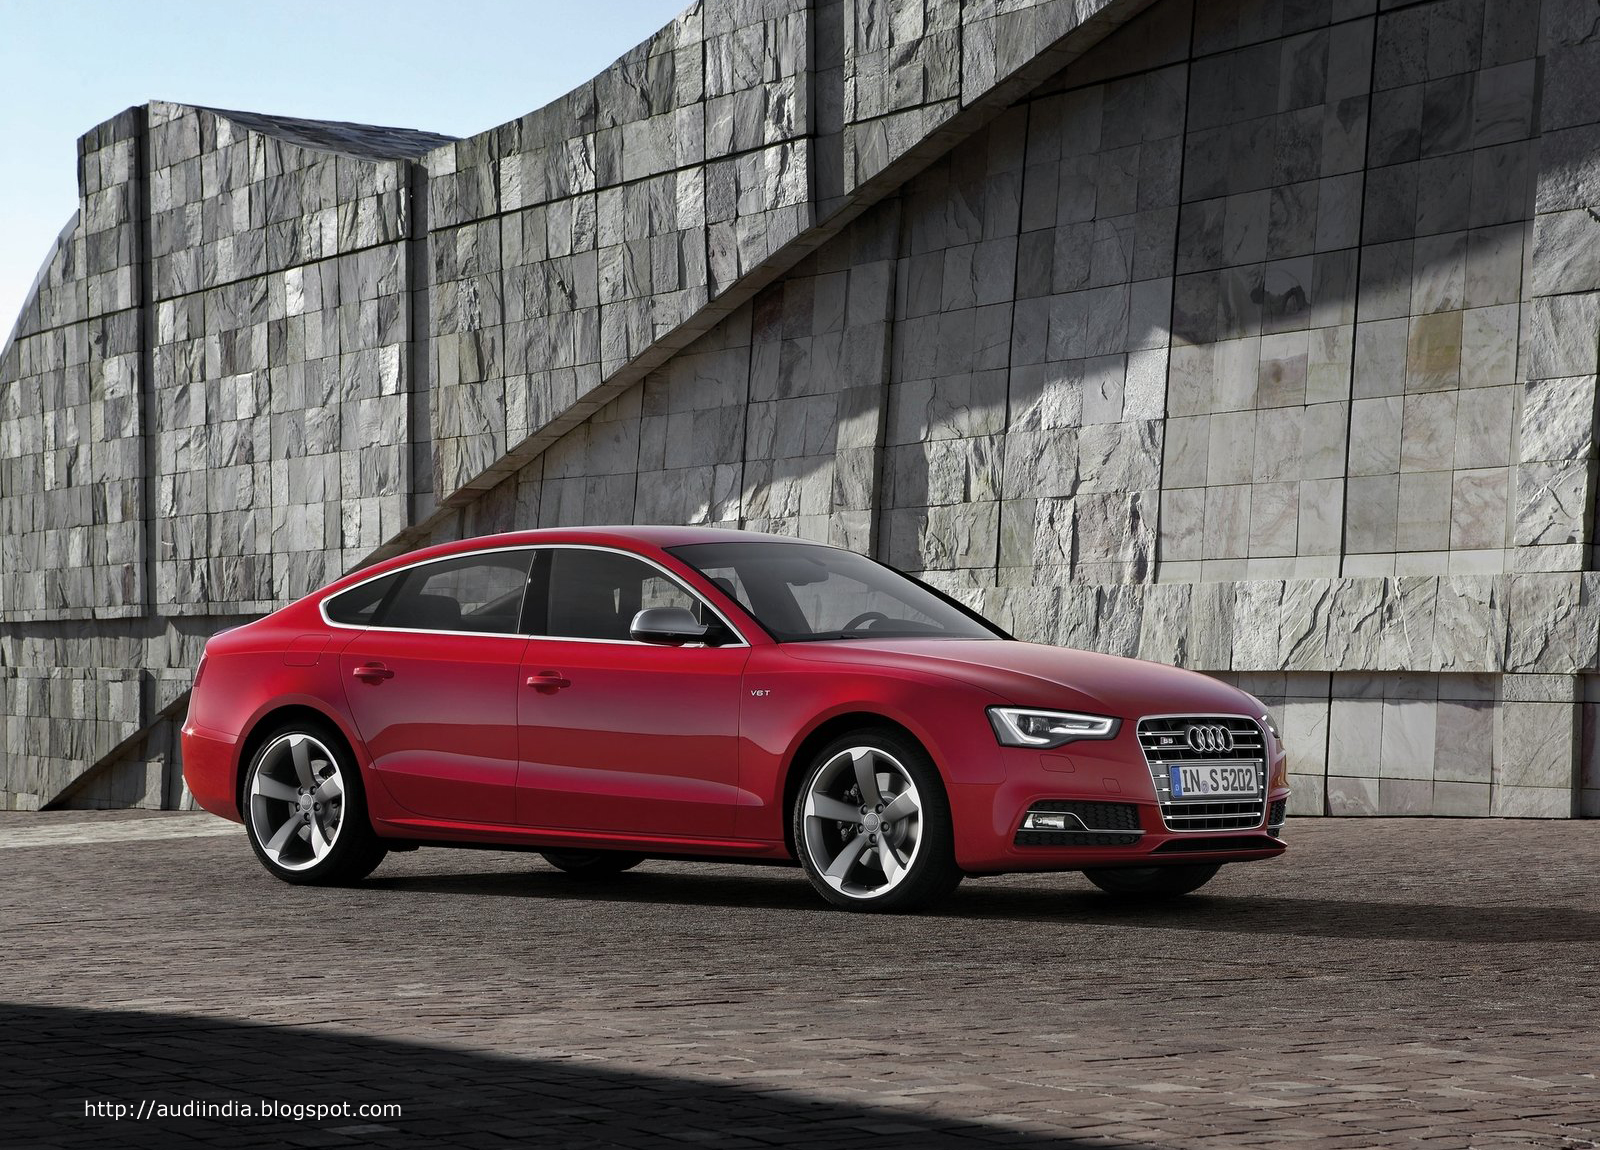 http://2.bp.blogspot.com/-5X4gPHM5h2M/TpbEZav18PI/AAAAAAAABoY/kp5vob9IF08/s1600/Audi-S5_Sportback_2012_1600x1200_wallpaper_02+copy.jpg